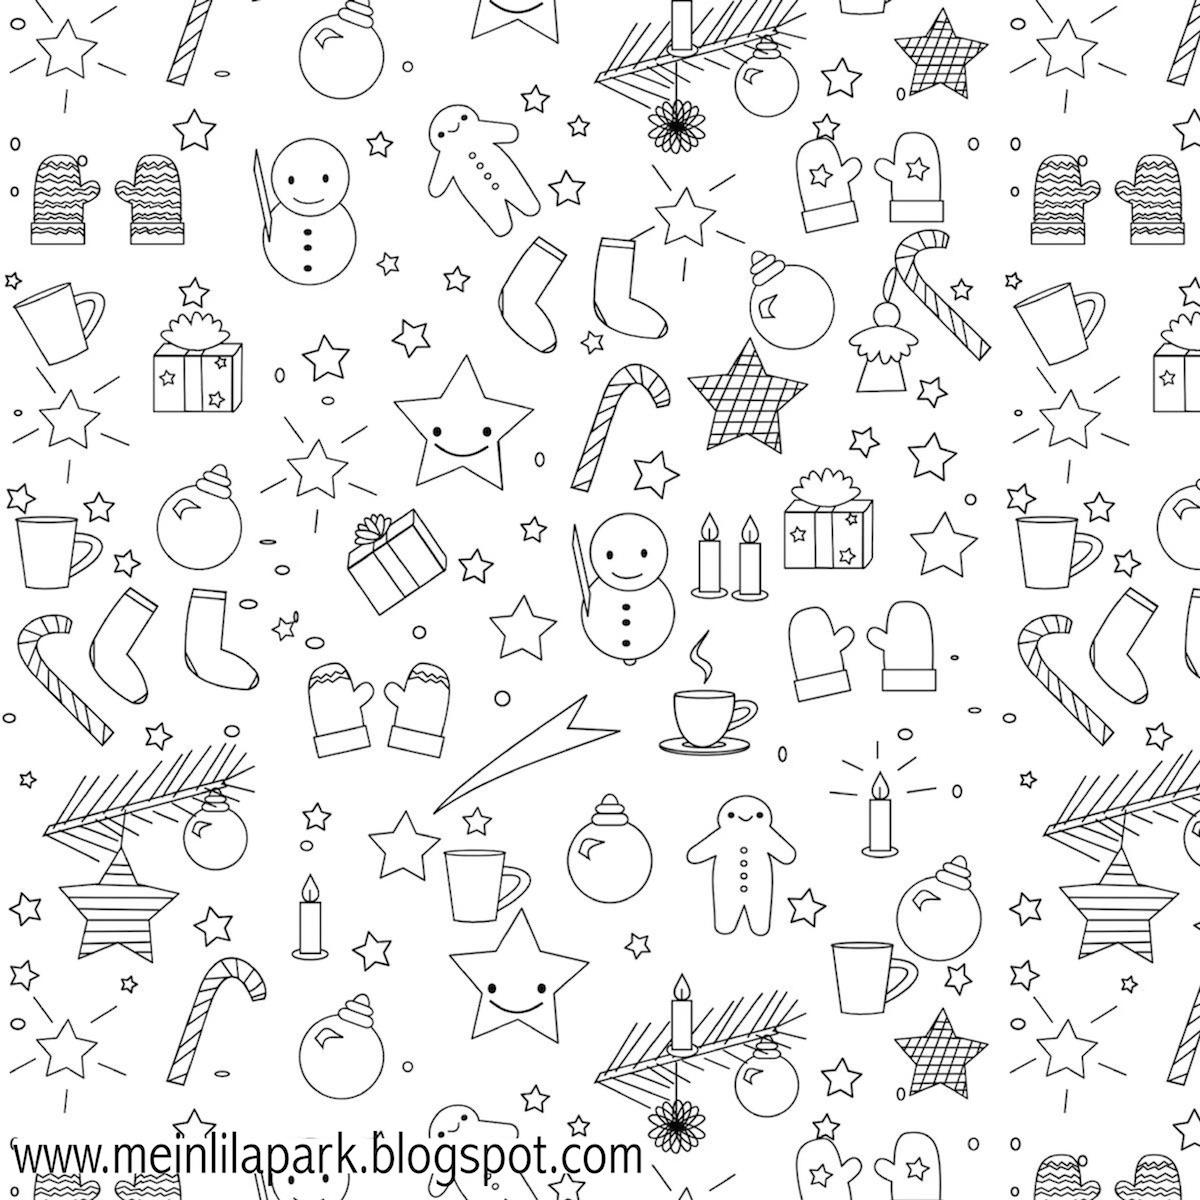 Free printable Christmas coloring page - ausdruckbares Malblatt ...